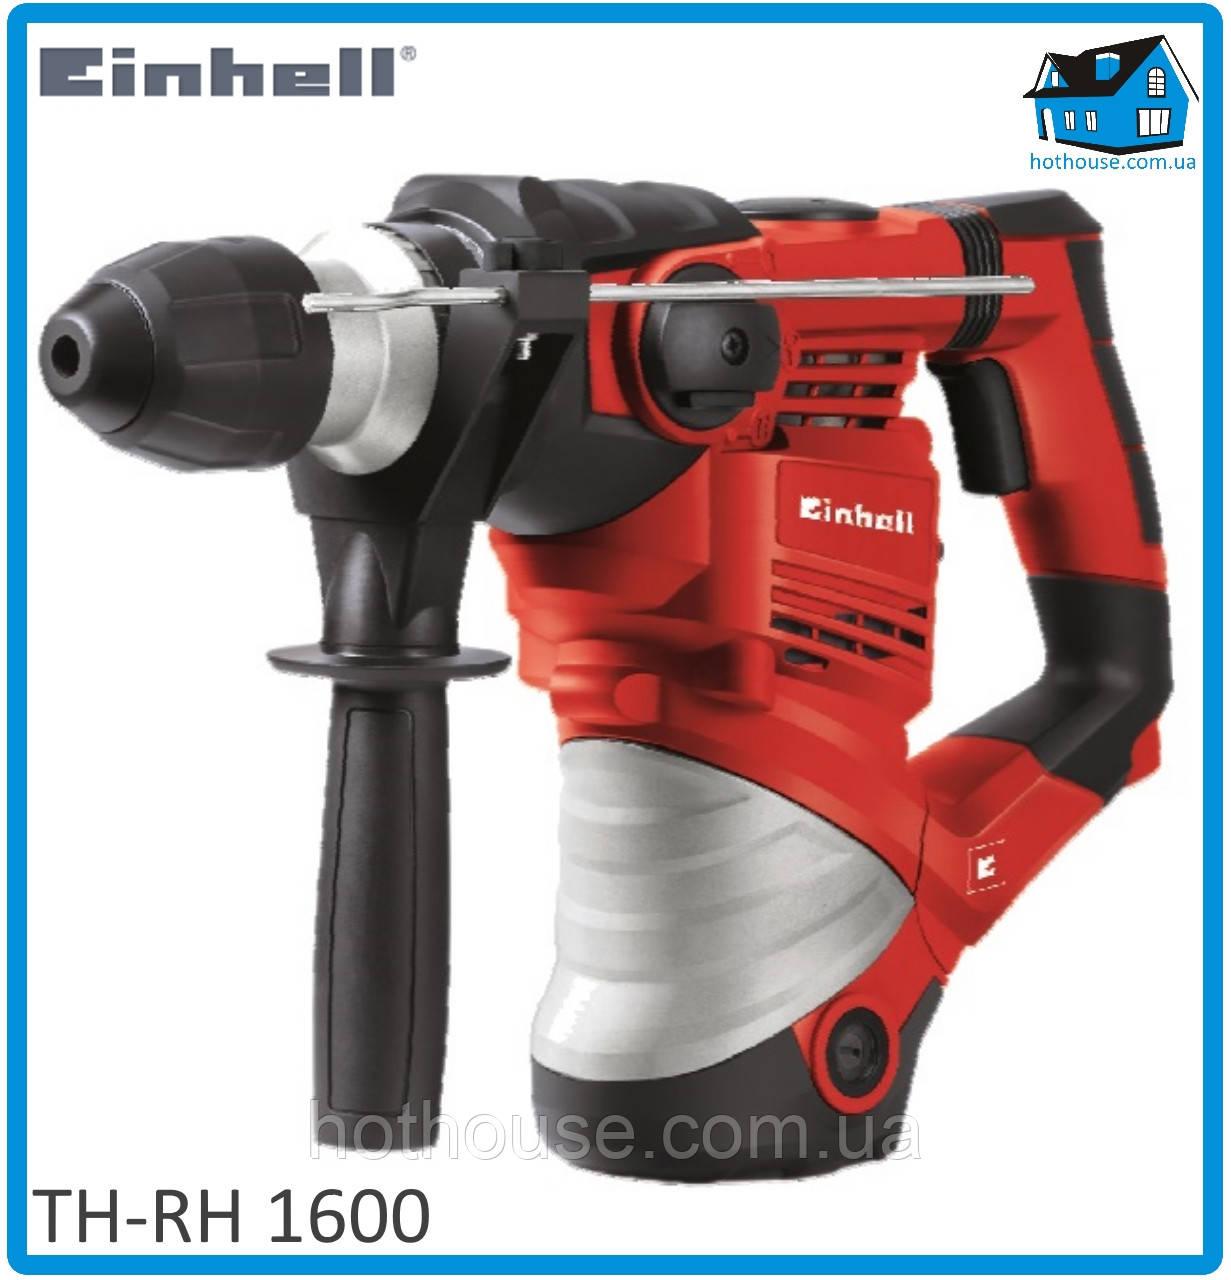 Перфоратор Einhell TH-RH 1600